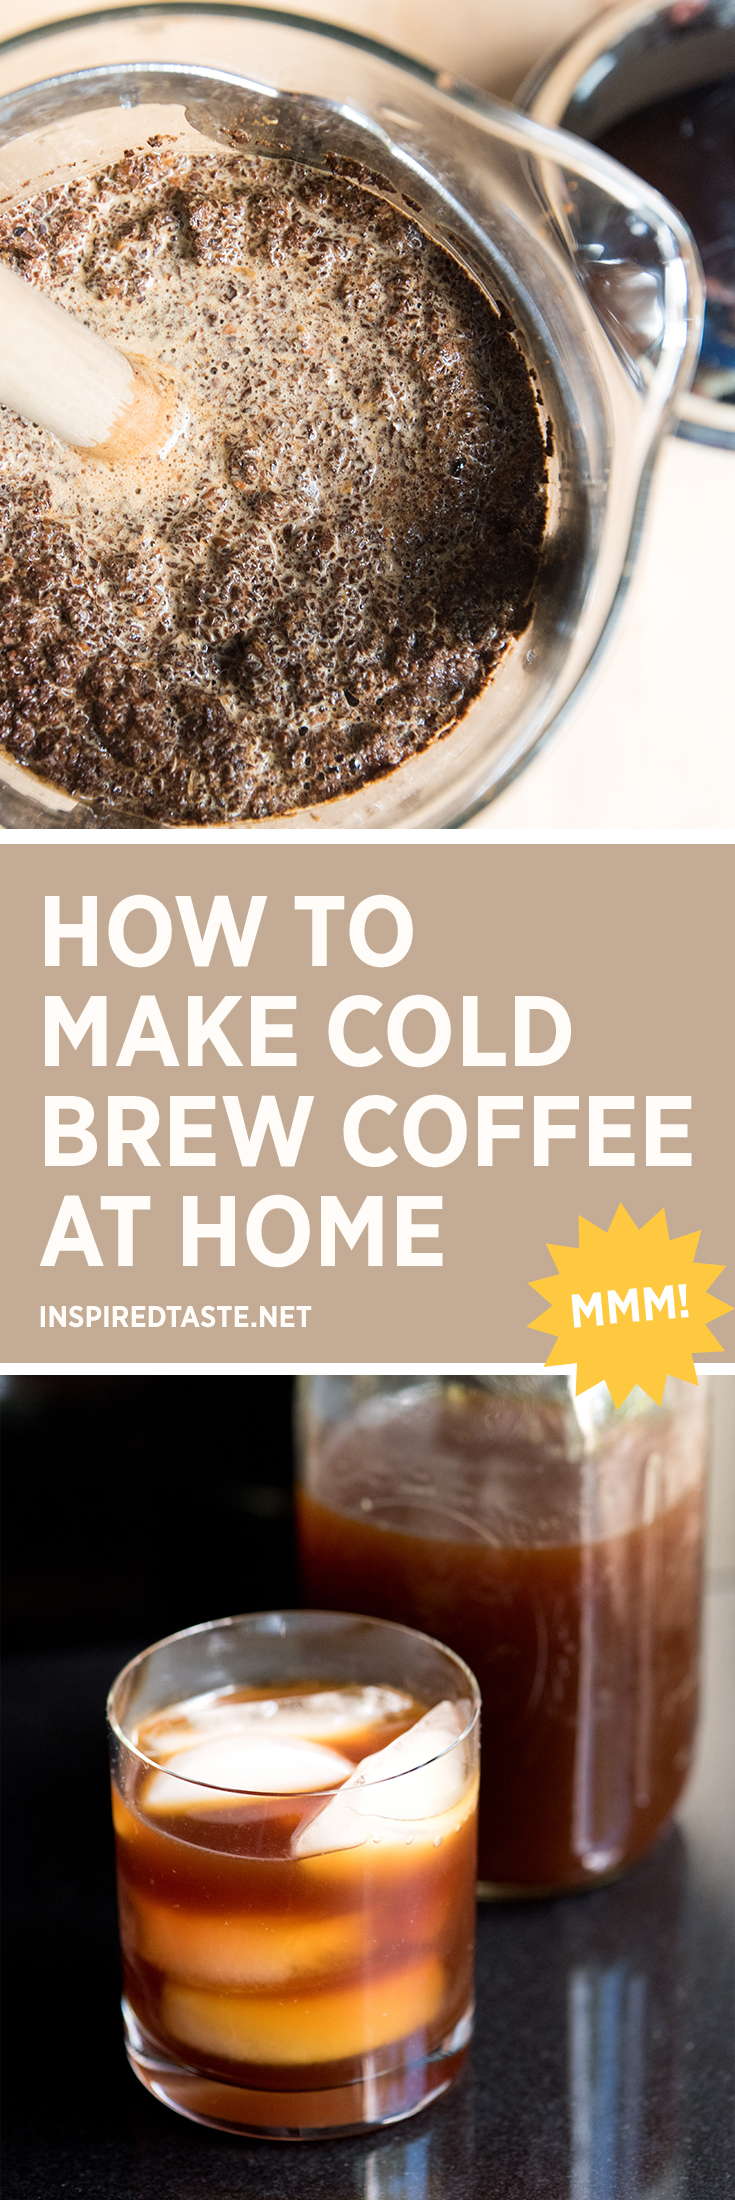 How to make homemade cold brew coffee recipe homemade